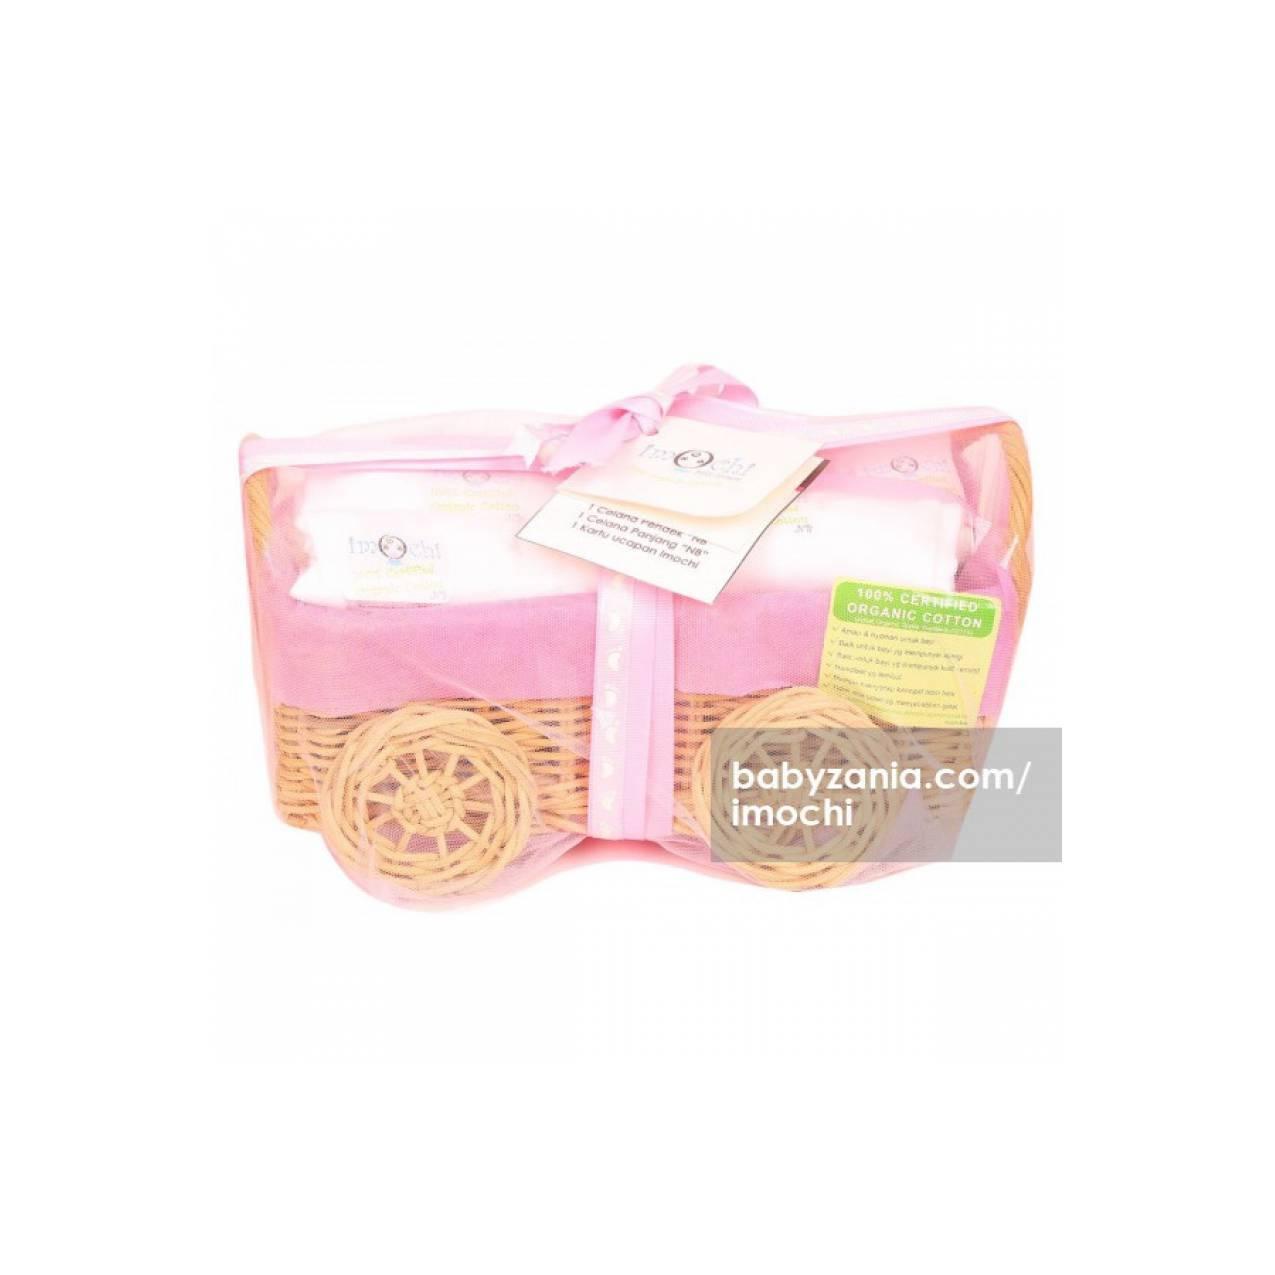 Imochi Parcel Kotak Kecil Putih Girl T2909